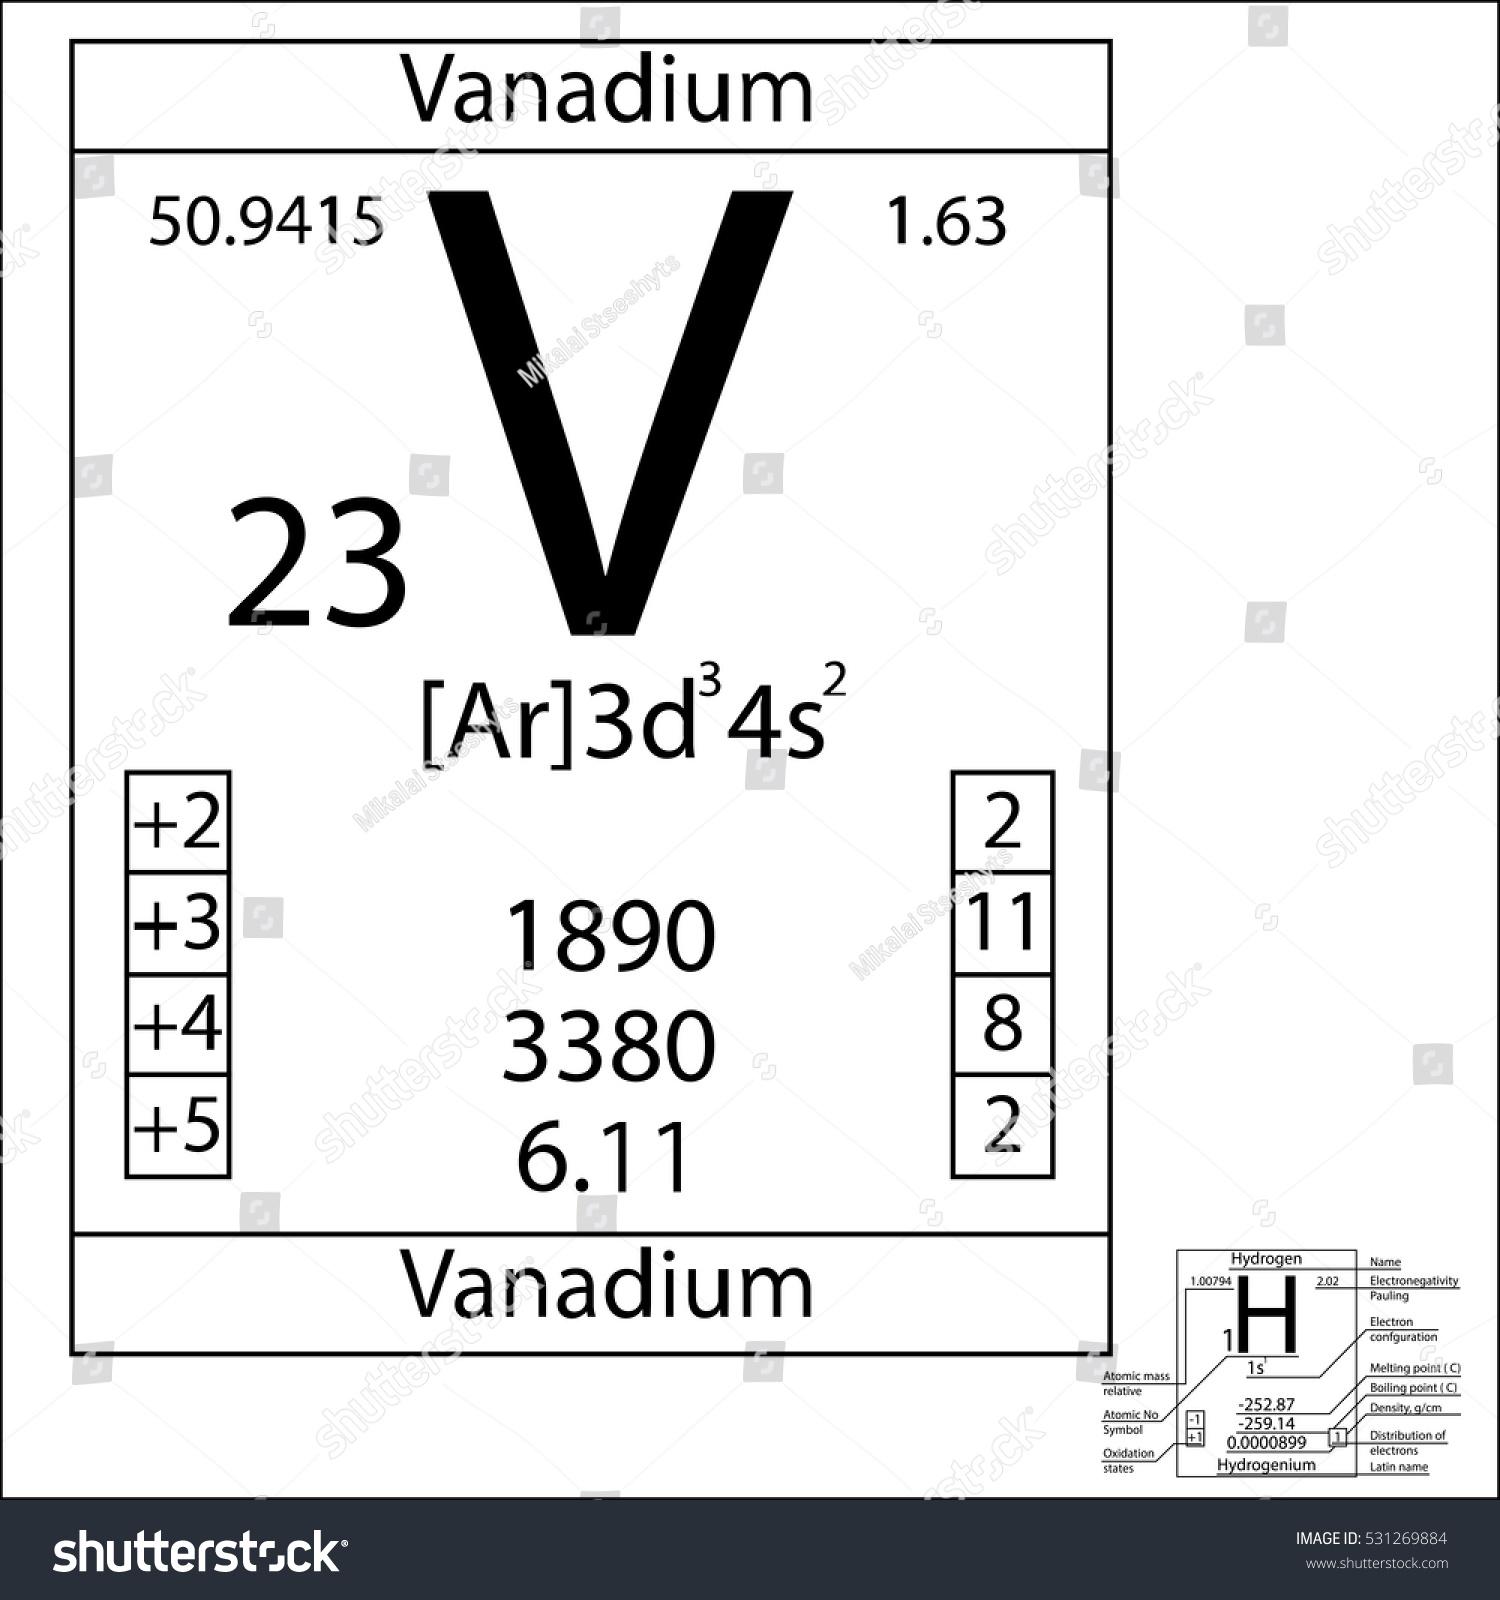 Periodic table element vanadium basic properties stock vector the periodic table element vanadium with the basic properties gamestrikefo Images